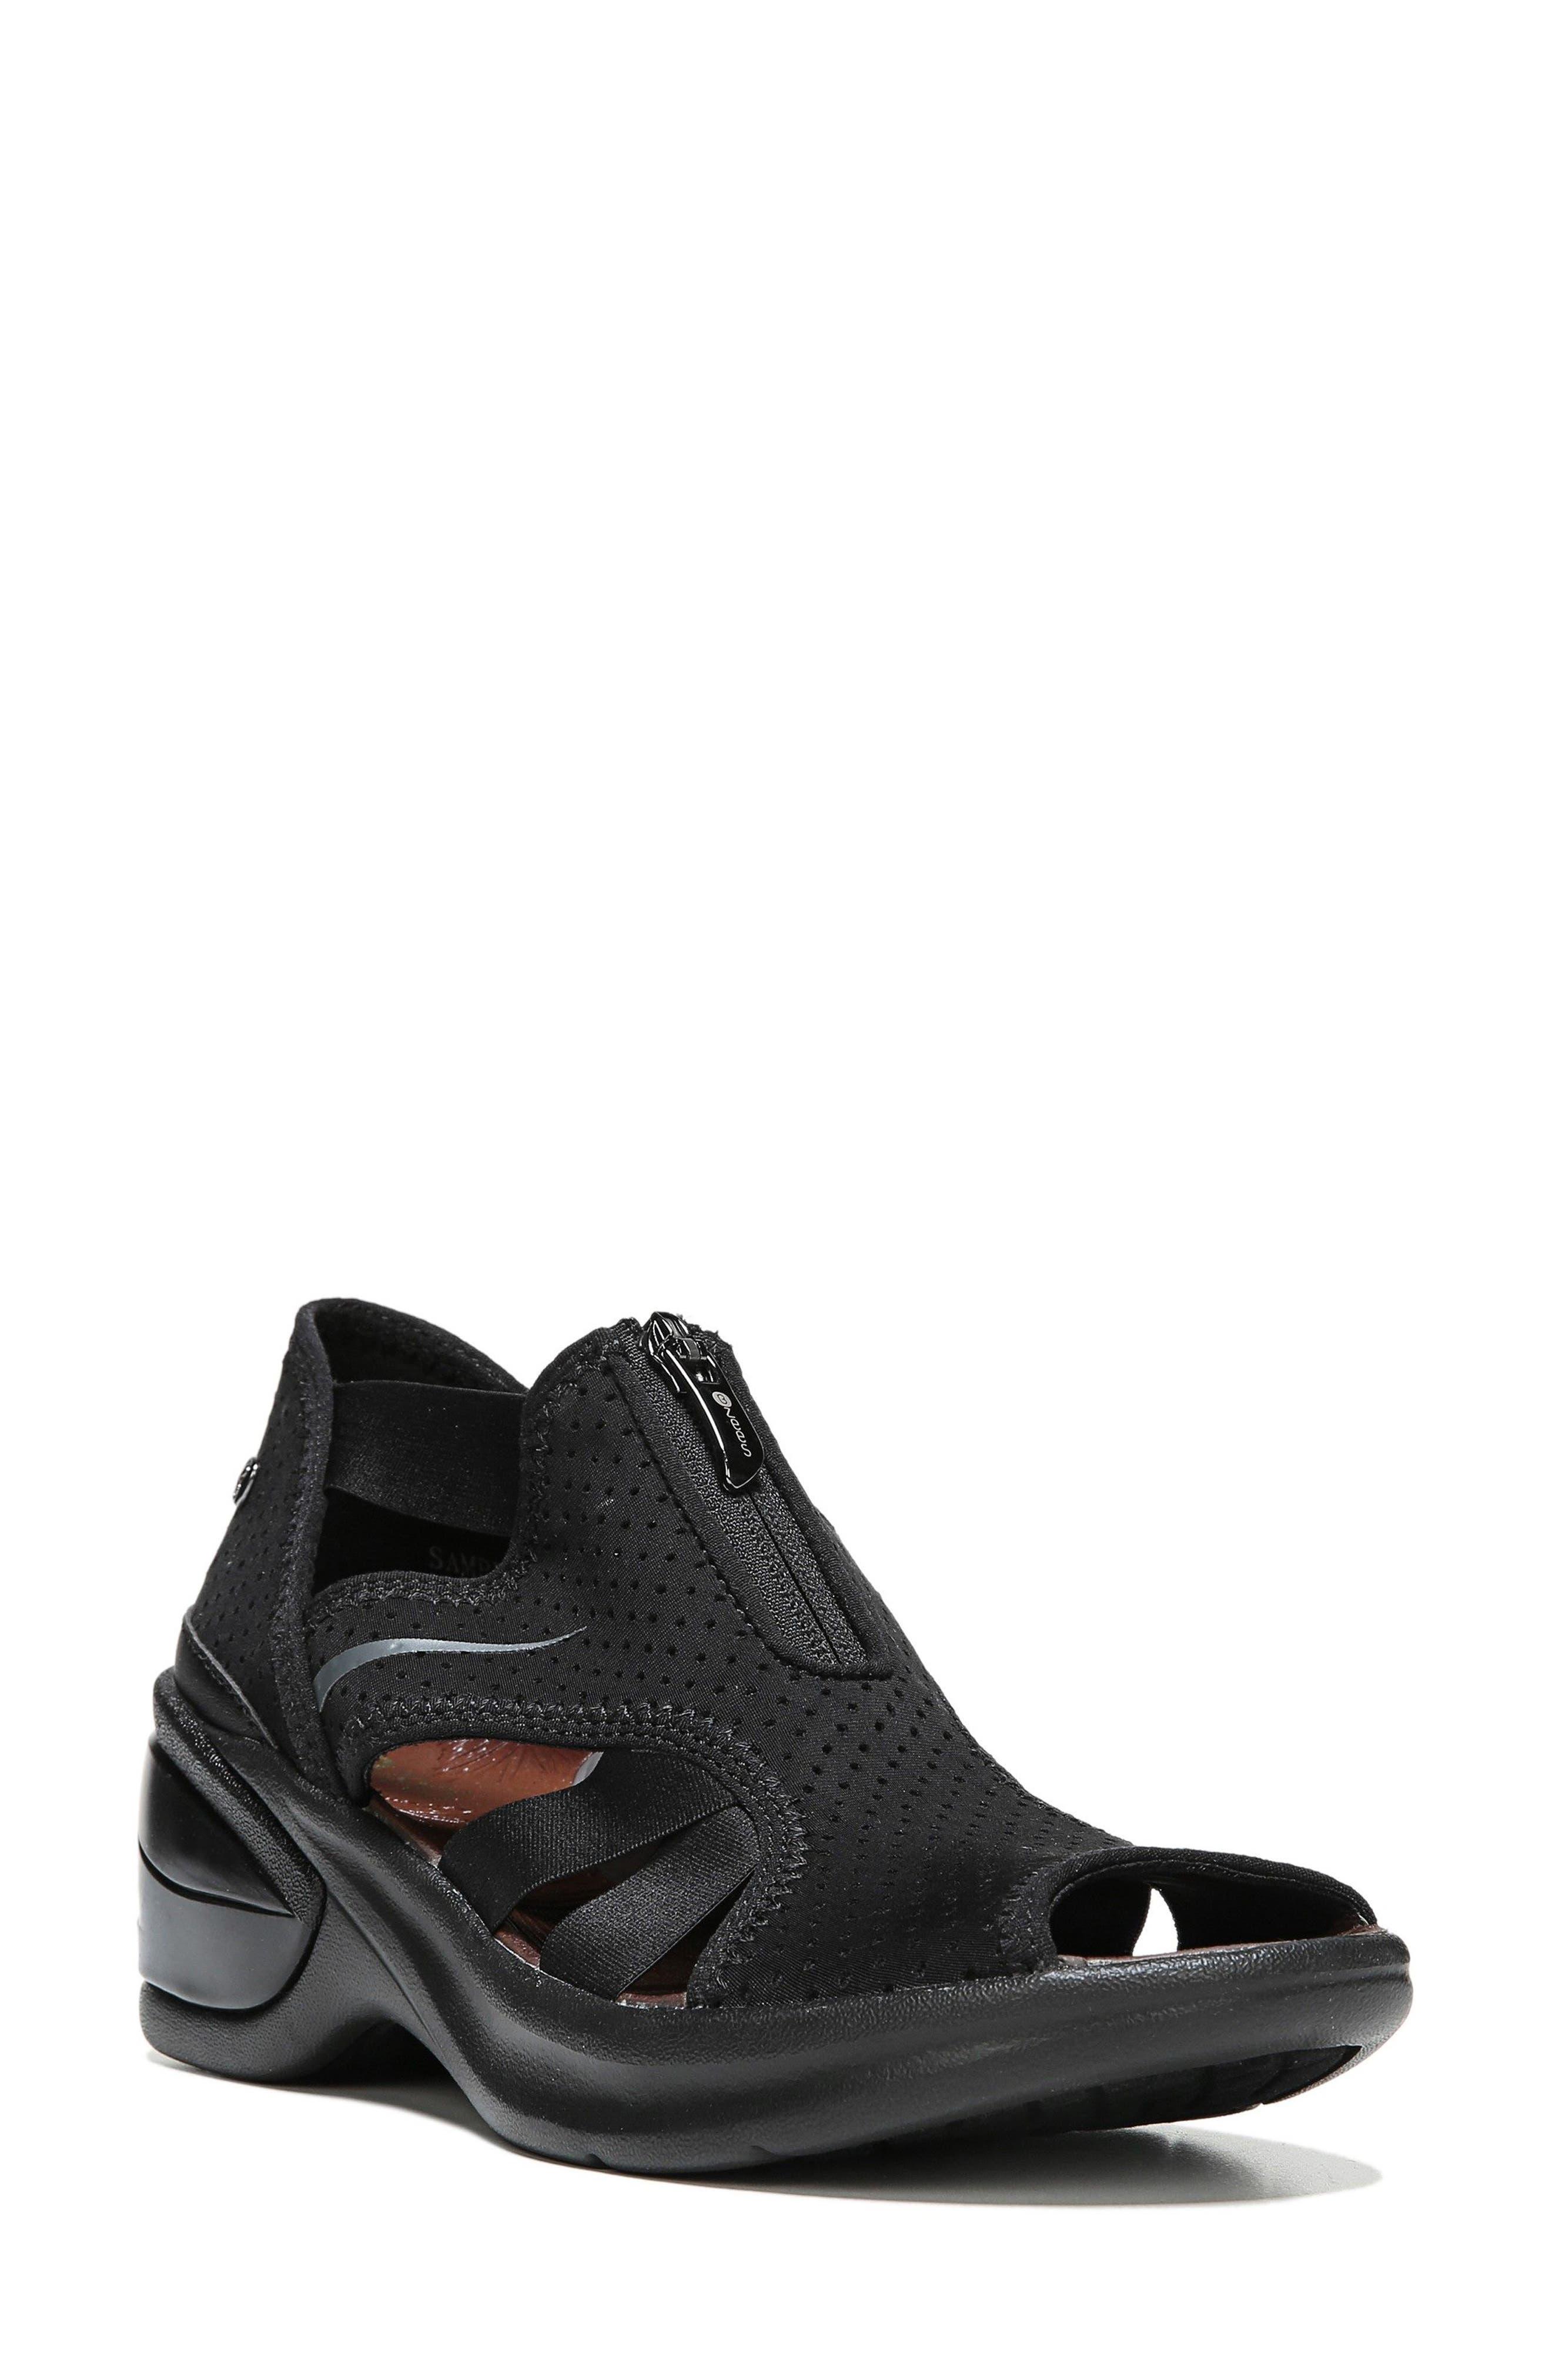 Krave Sandal,                         Main,                         color, BLACK FABRIC